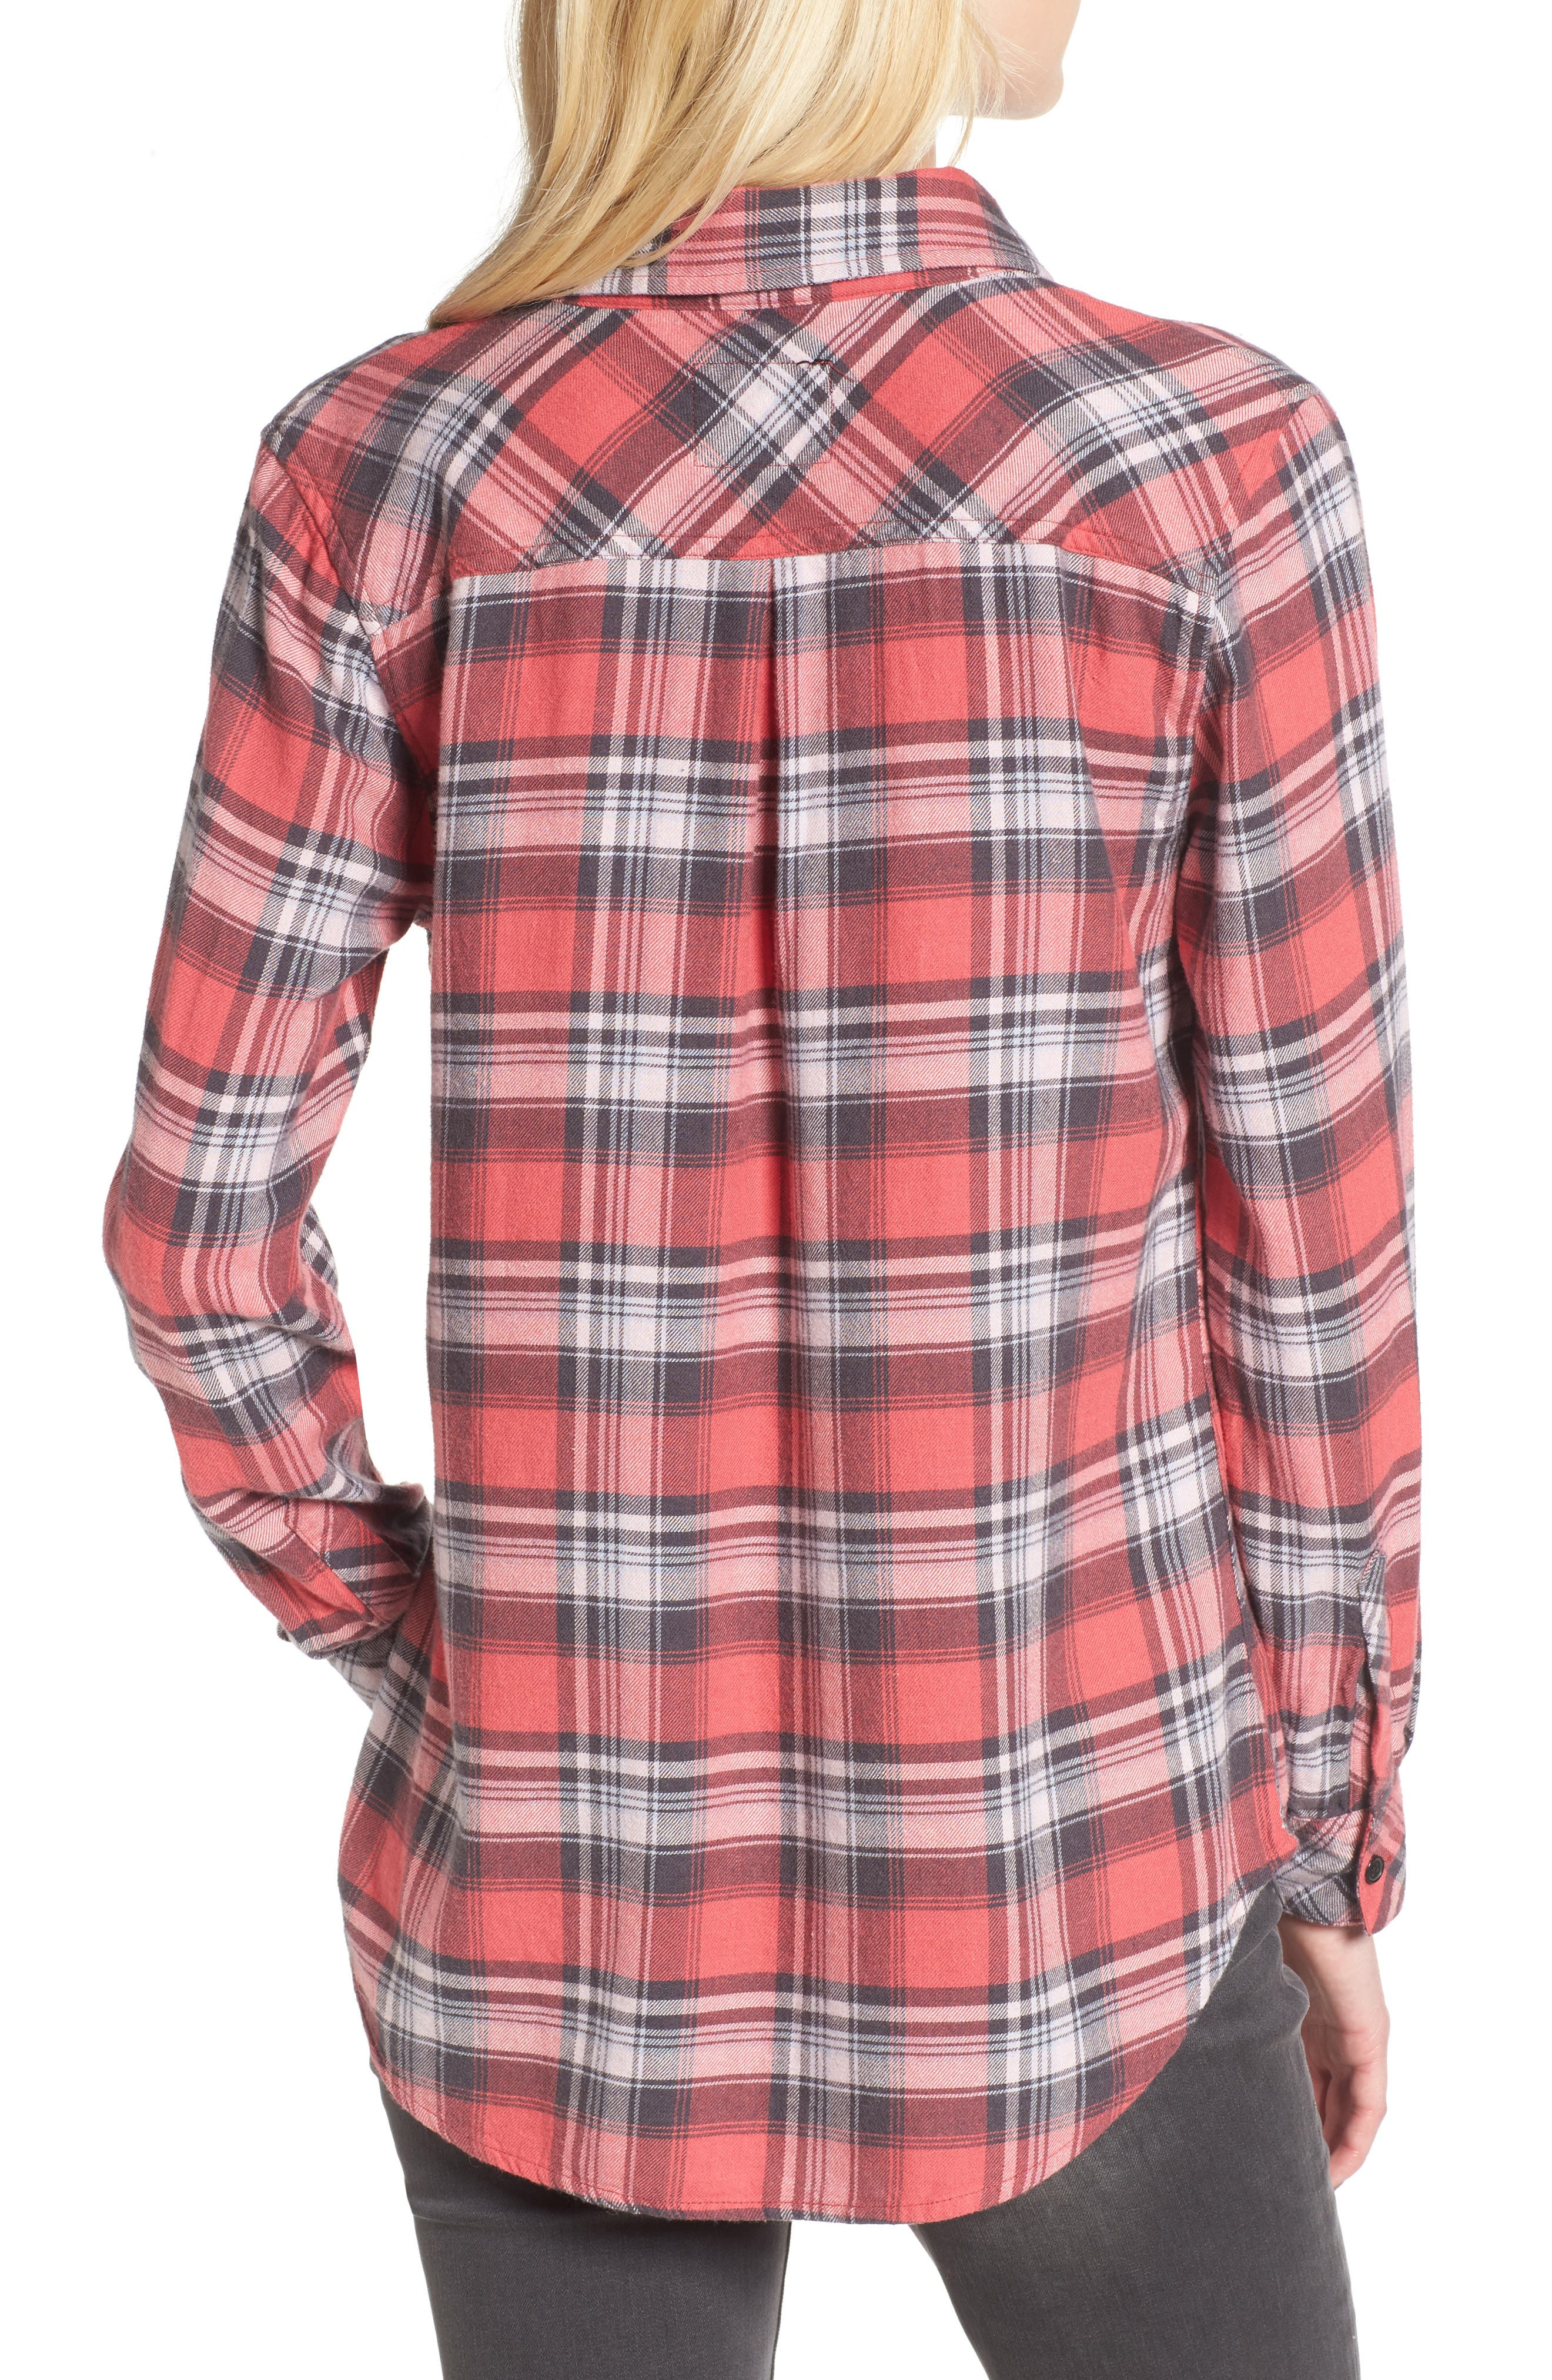 Milo Plaid Shirt,                             Alternate thumbnail 2, color,                             BONFIRE/ ASH